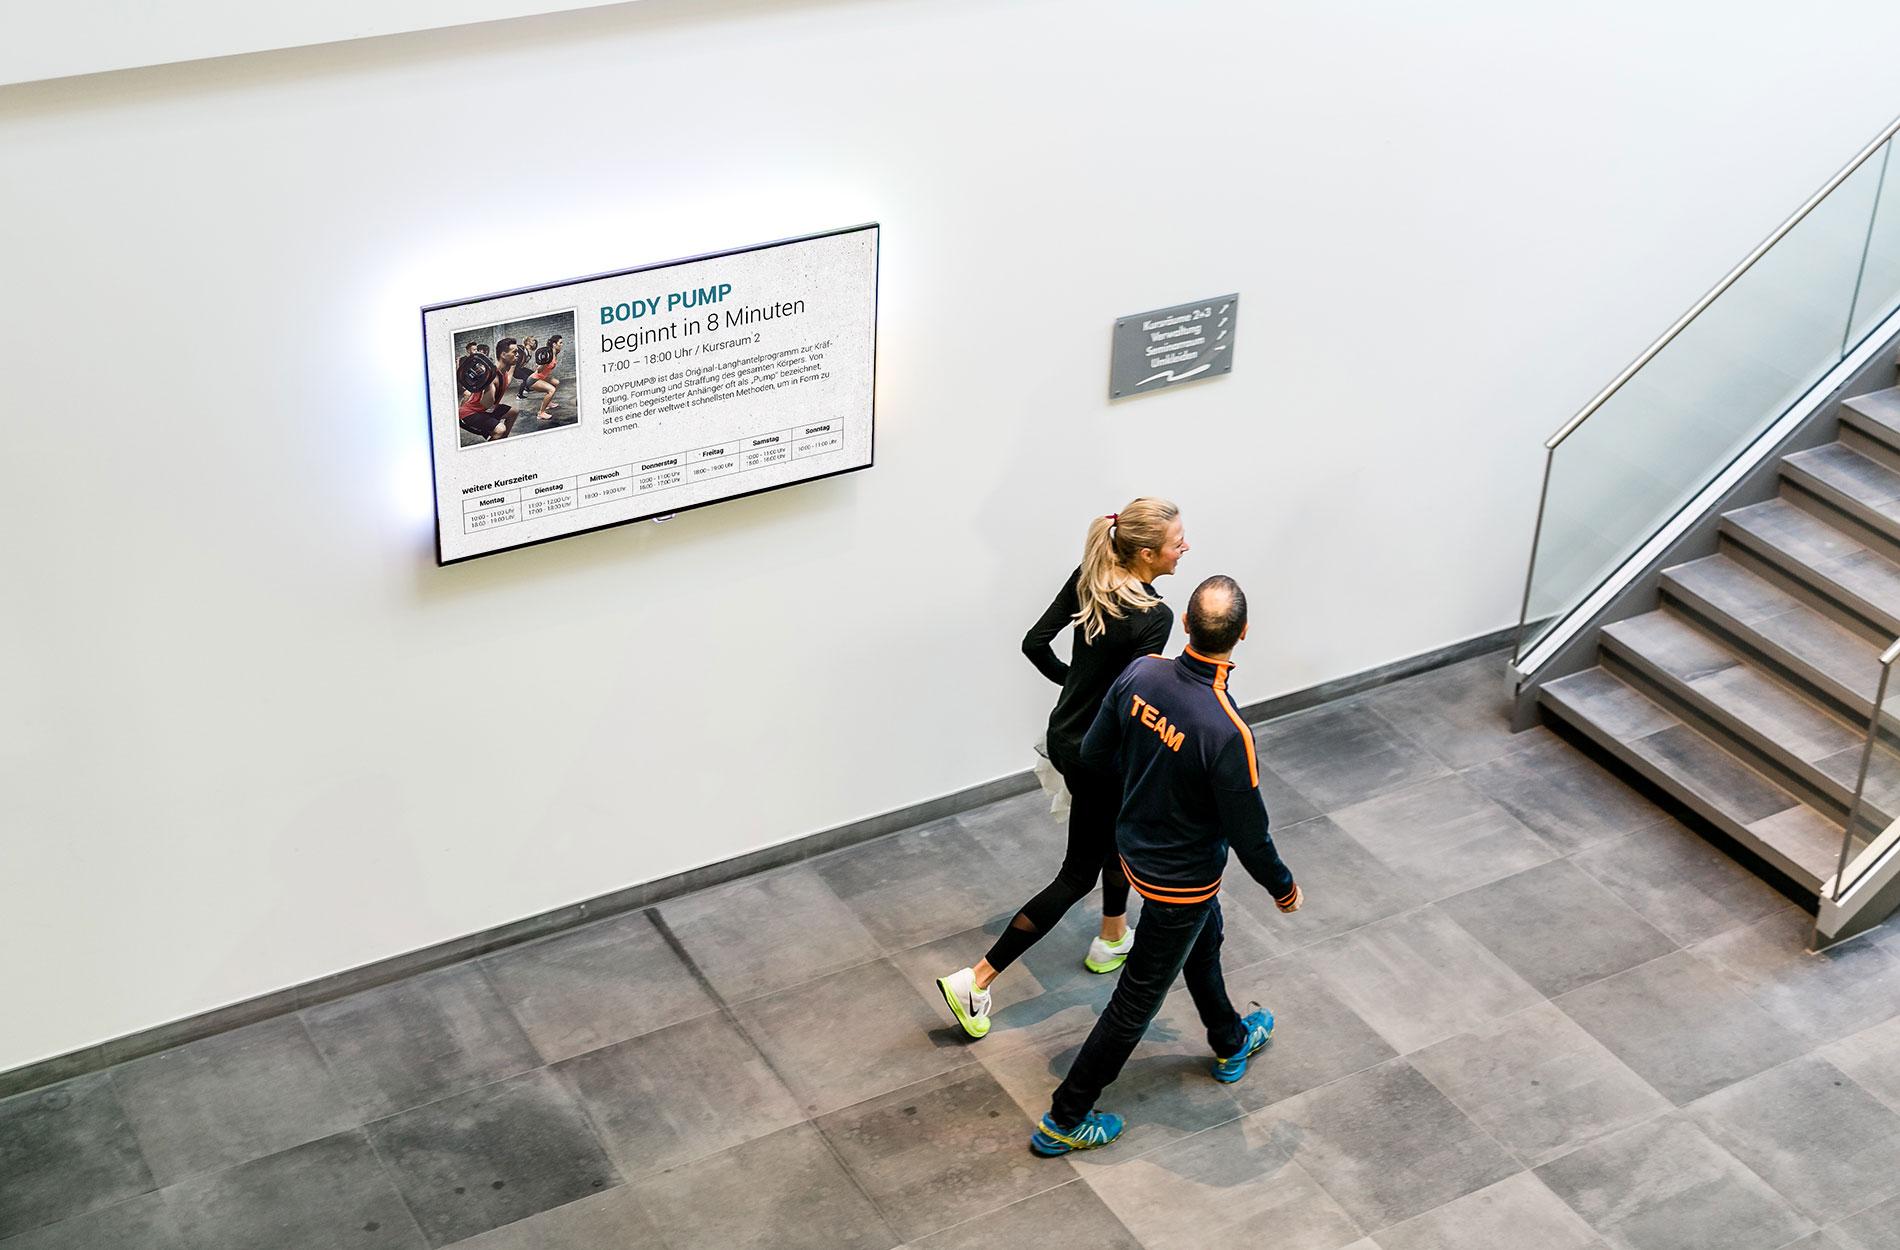 Kursplan Digital Signage für Fitnessclubs